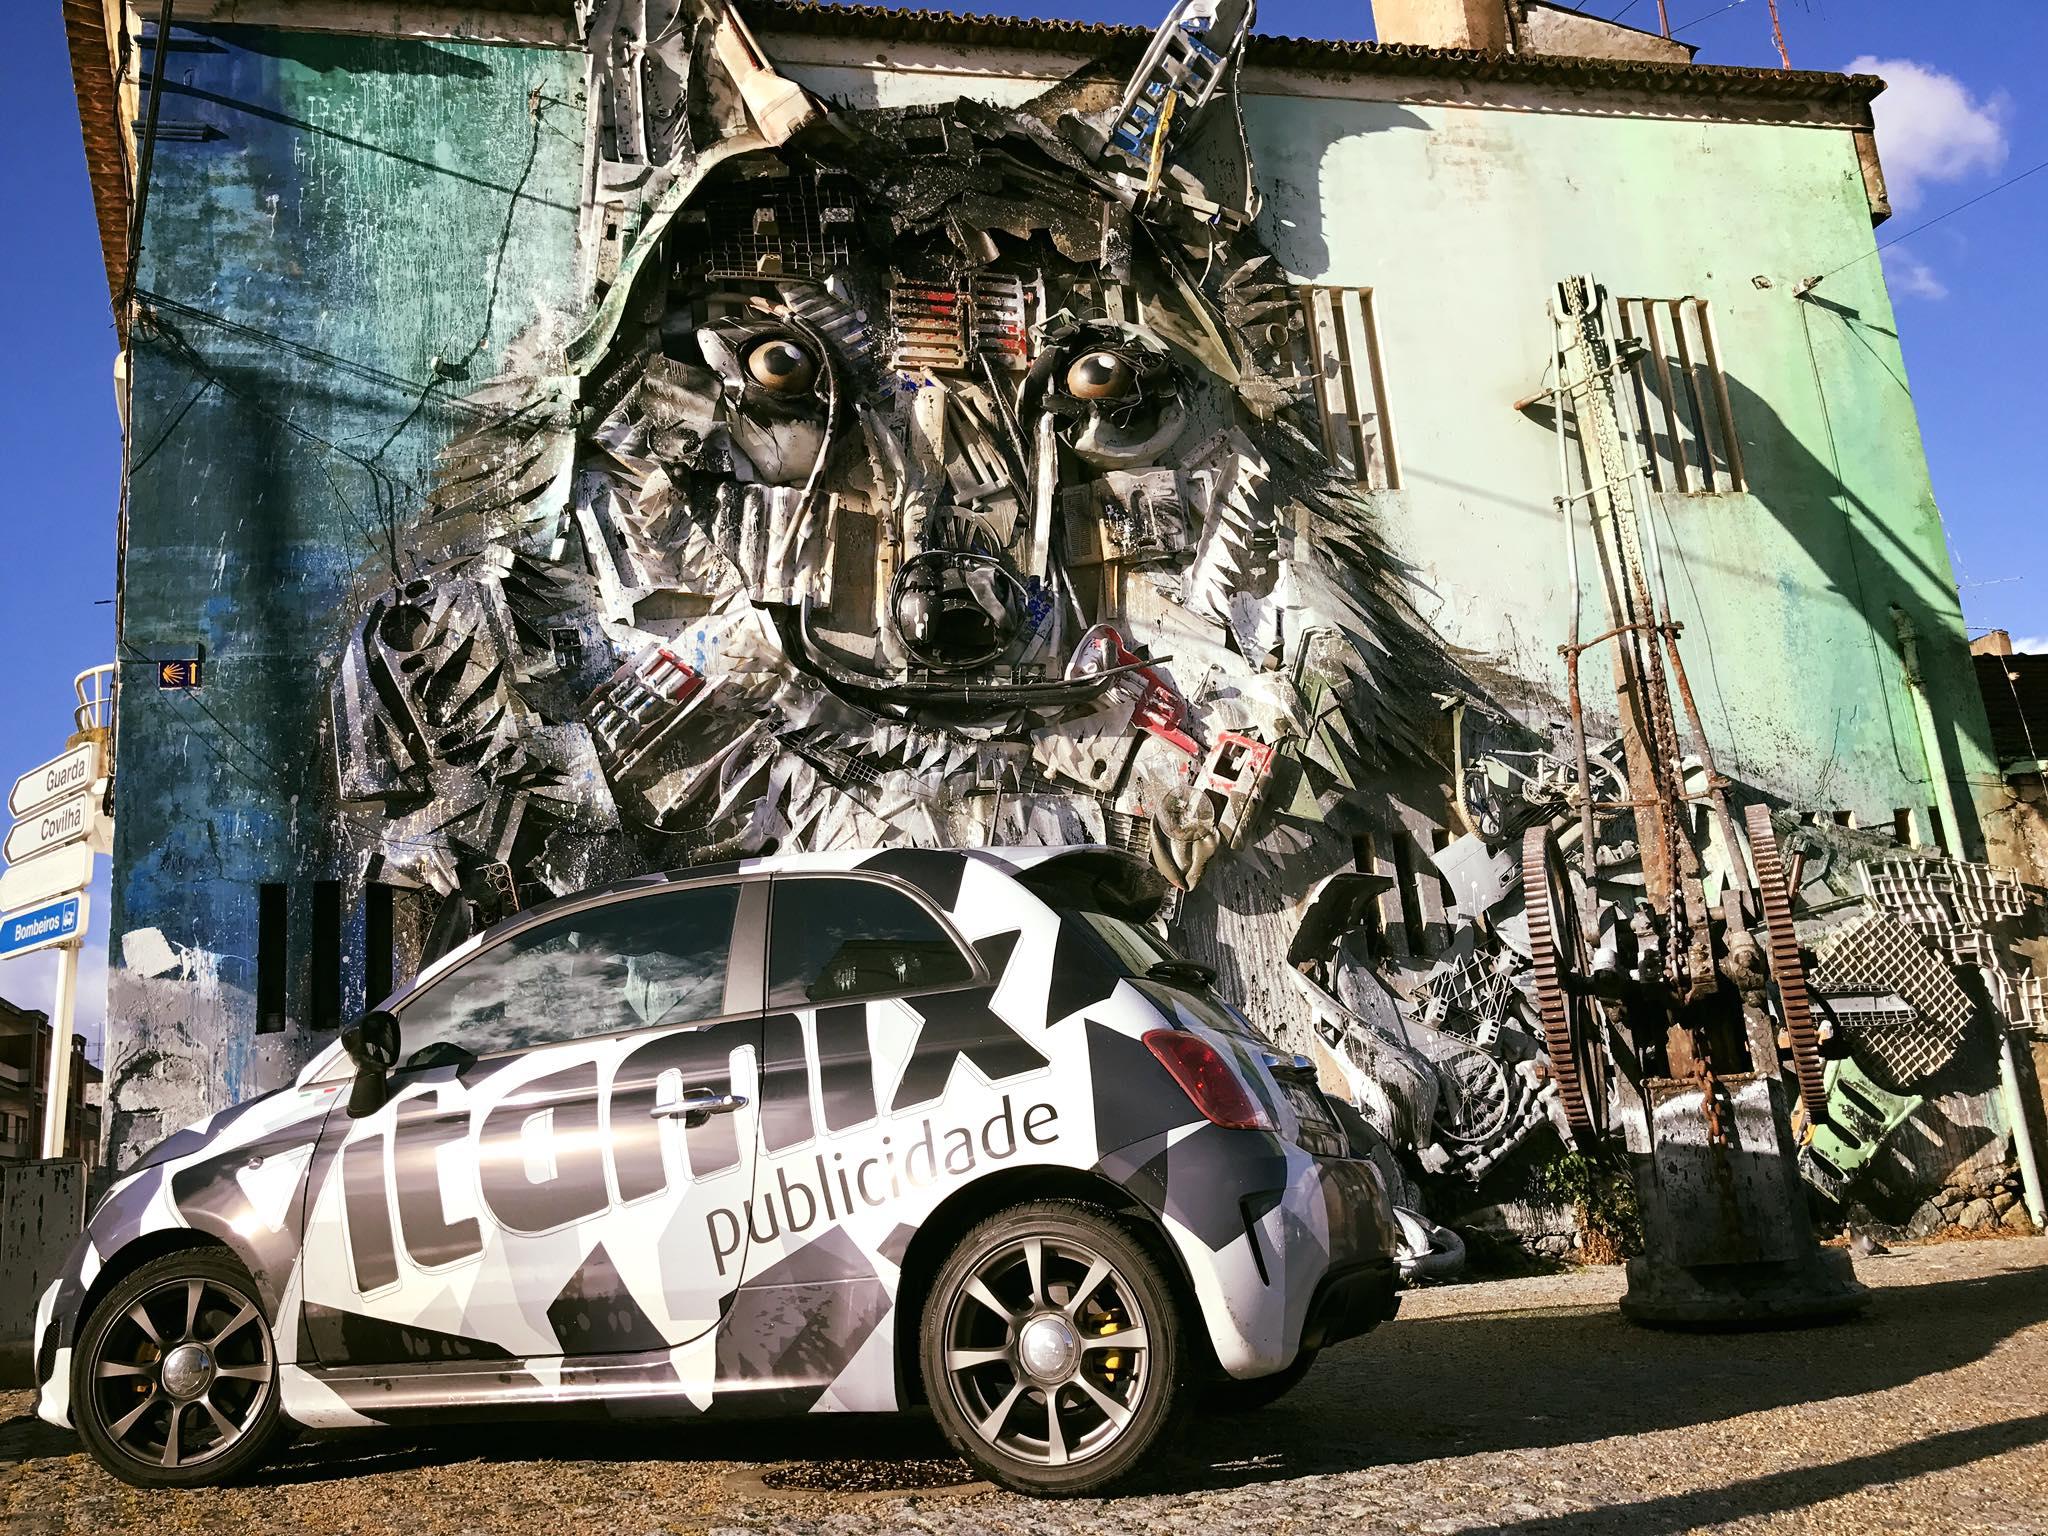 bordalo-II-vitaix-publicidade-decoracao-viaturas-abarth